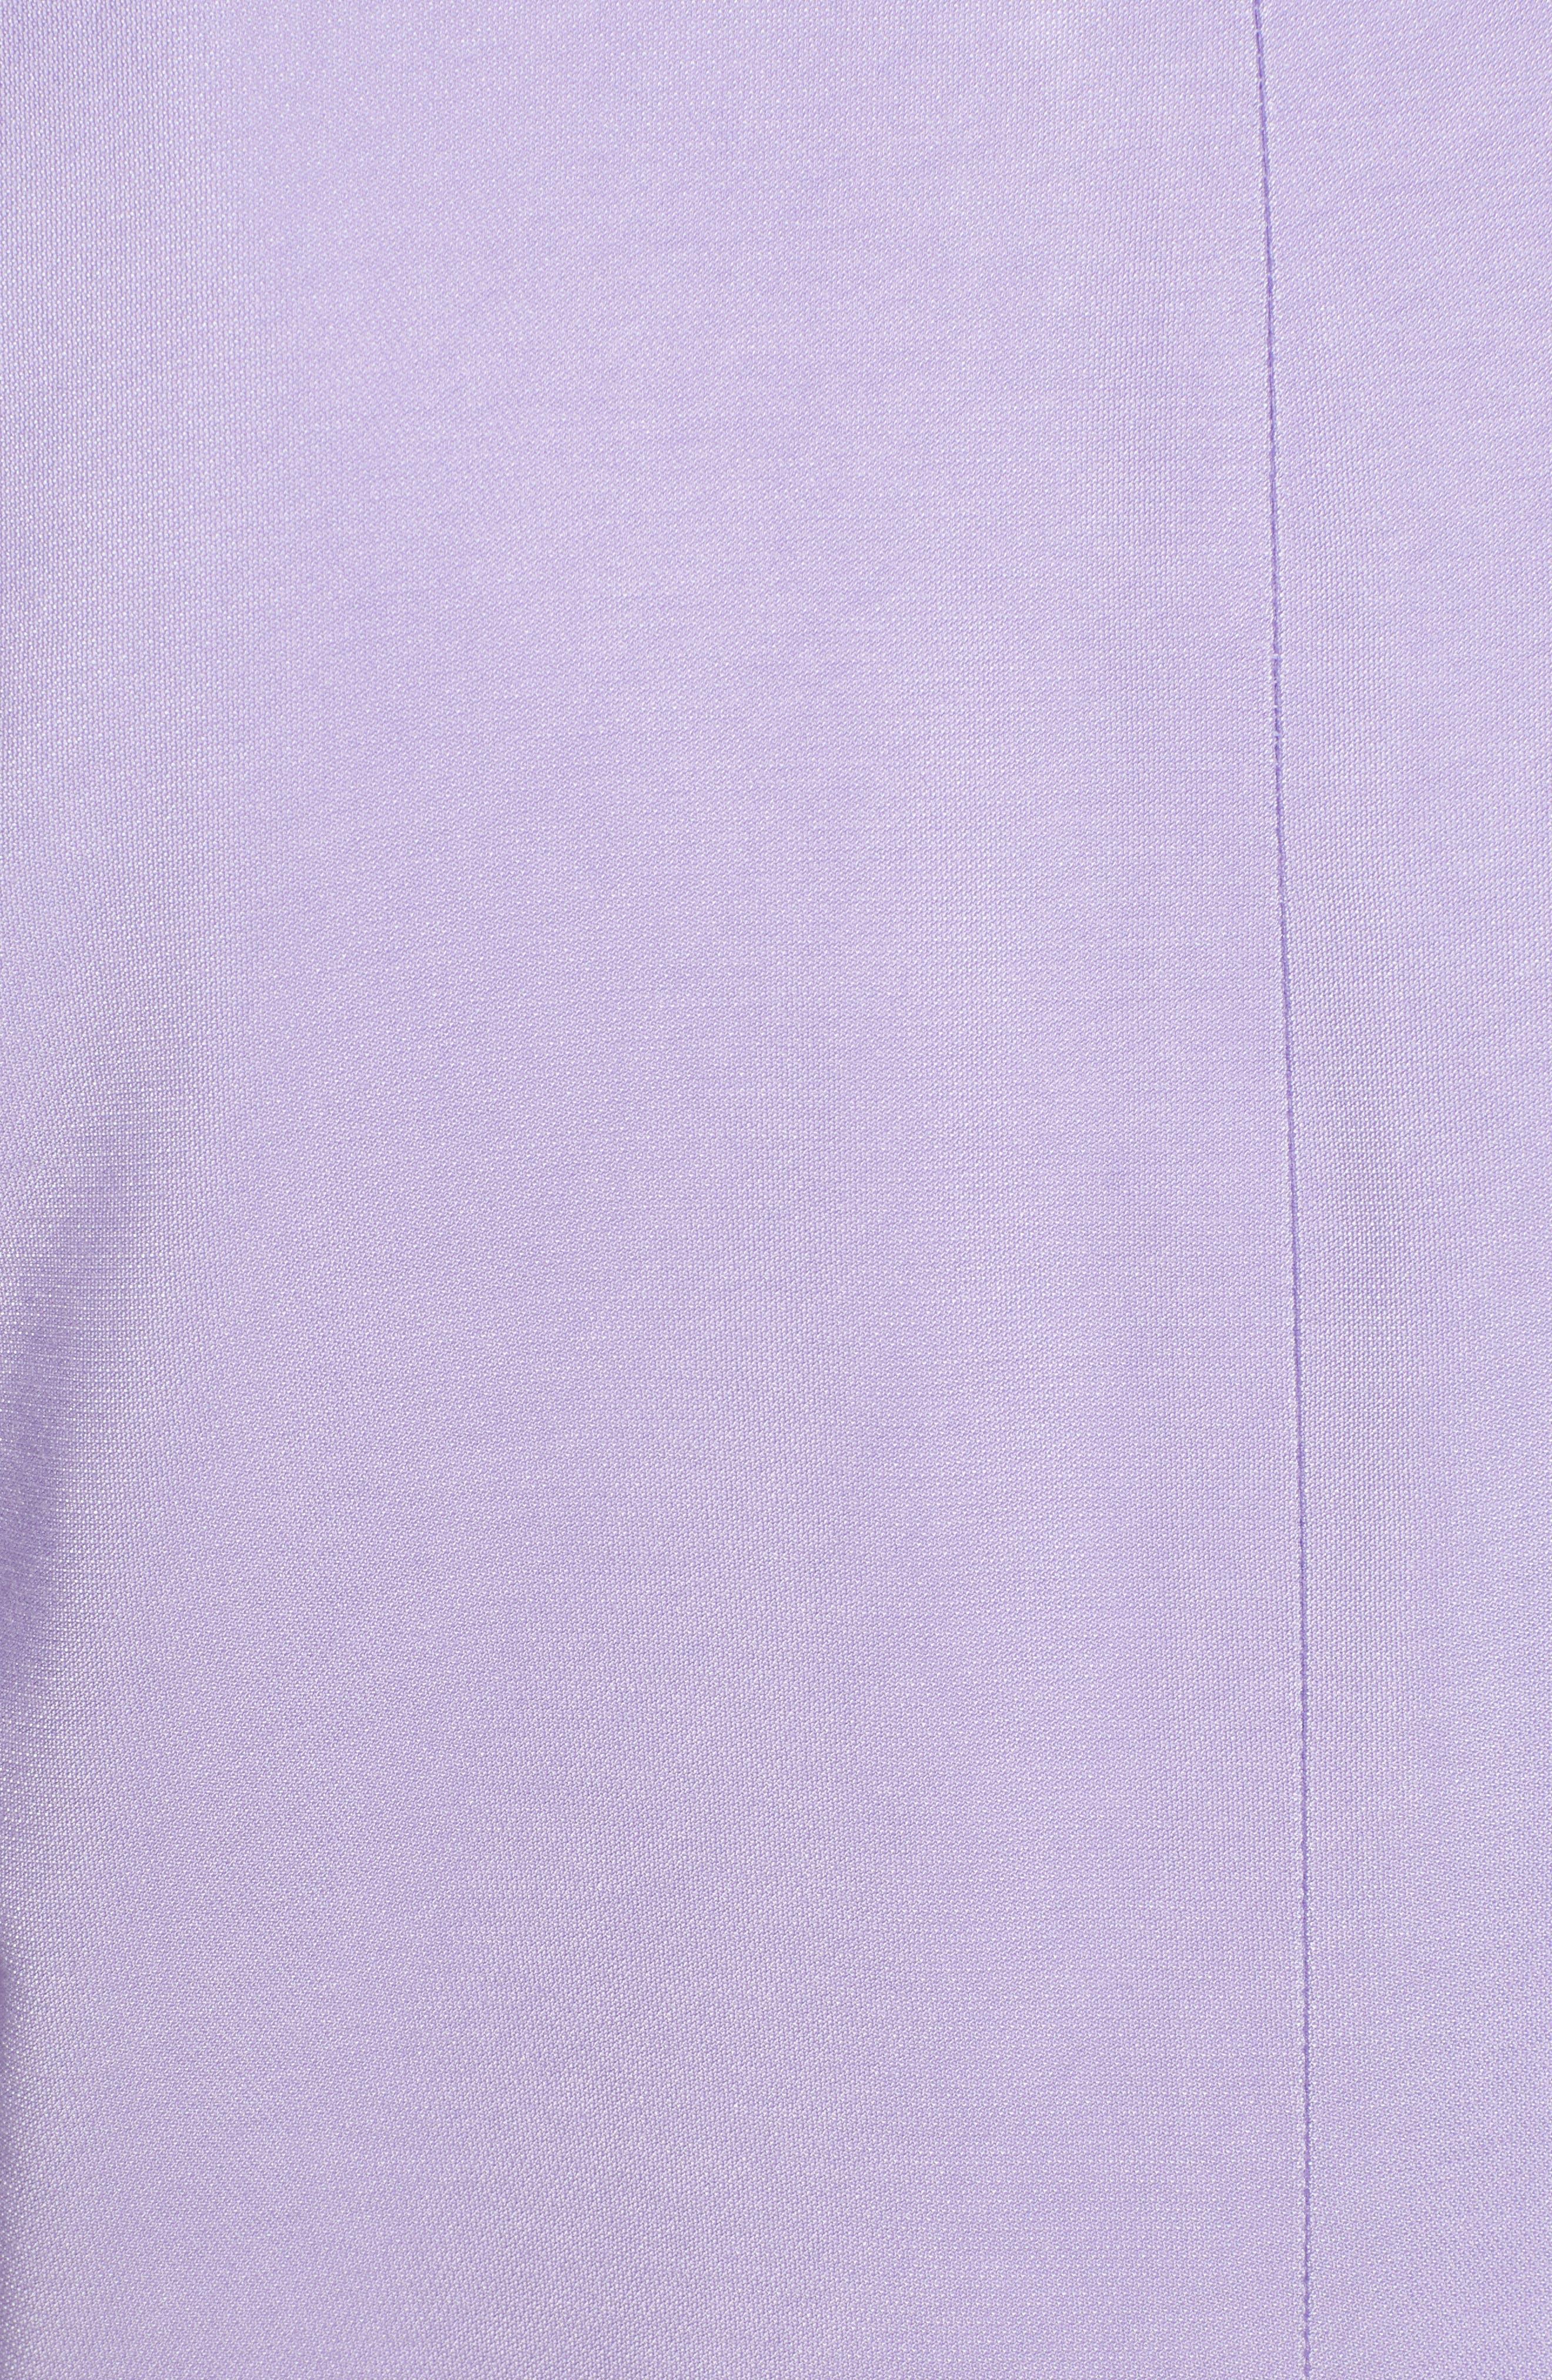 Belted Jacket,                             Alternate thumbnail 8, color,                             PURPLE BONNET